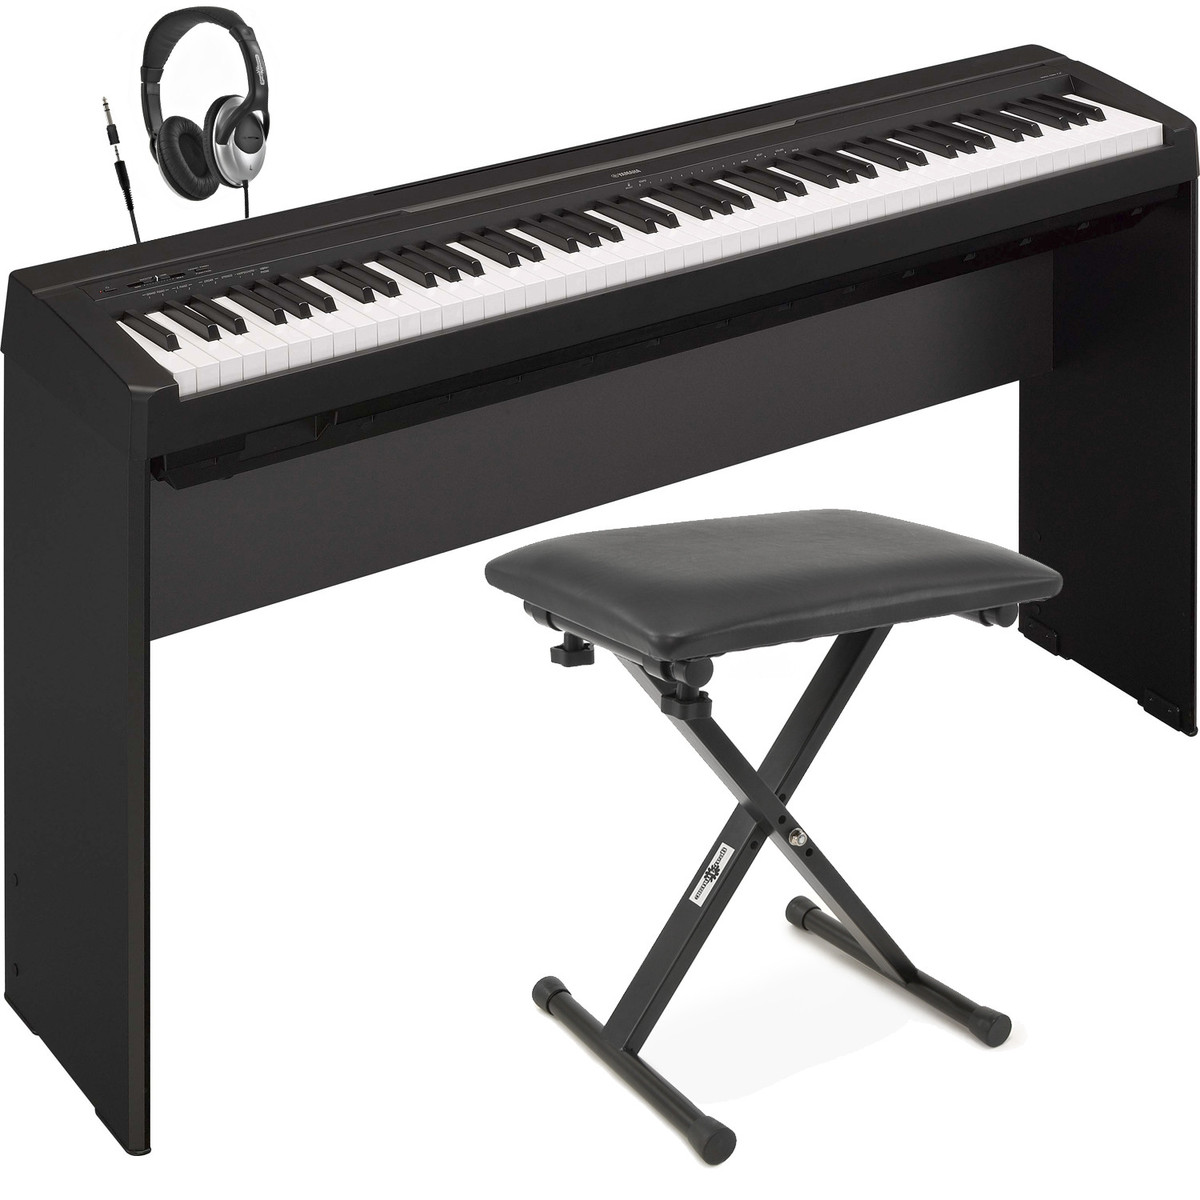 Yamaha Keyboard Stand And Bench